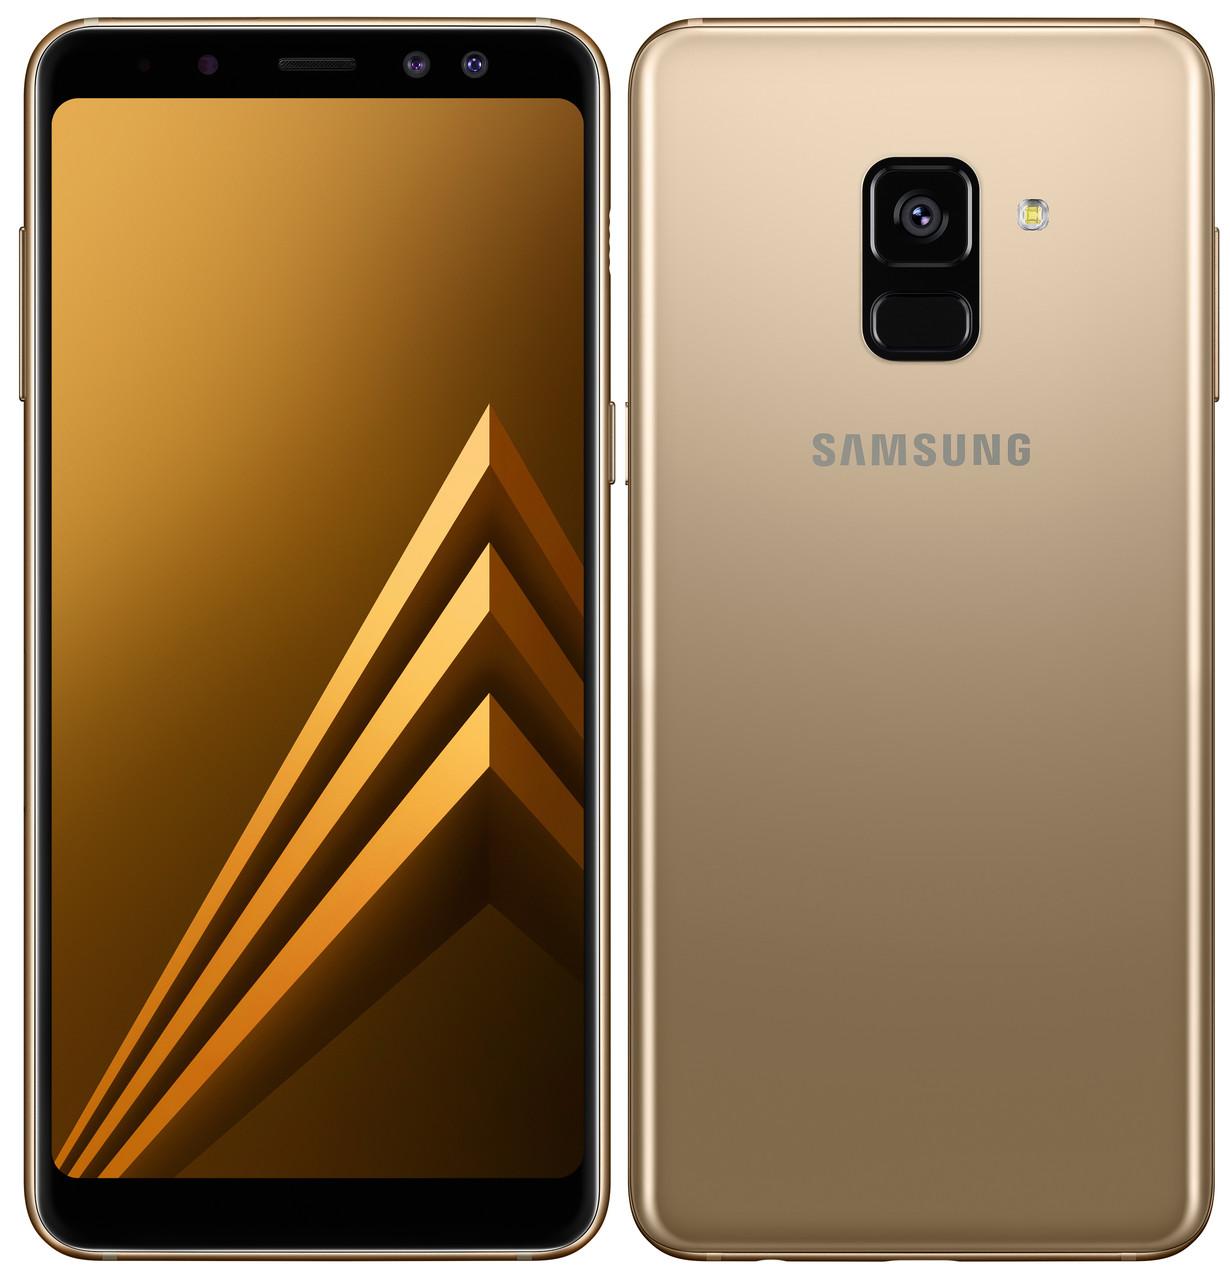 "Смартфон Samsung Galaxy A8+ 2018 (SM-A730FZDD) Gold, 4/32Gb, 8 ядер, 16/16+8Мп, 6"", 2 sim, 4G, 3500мАh."